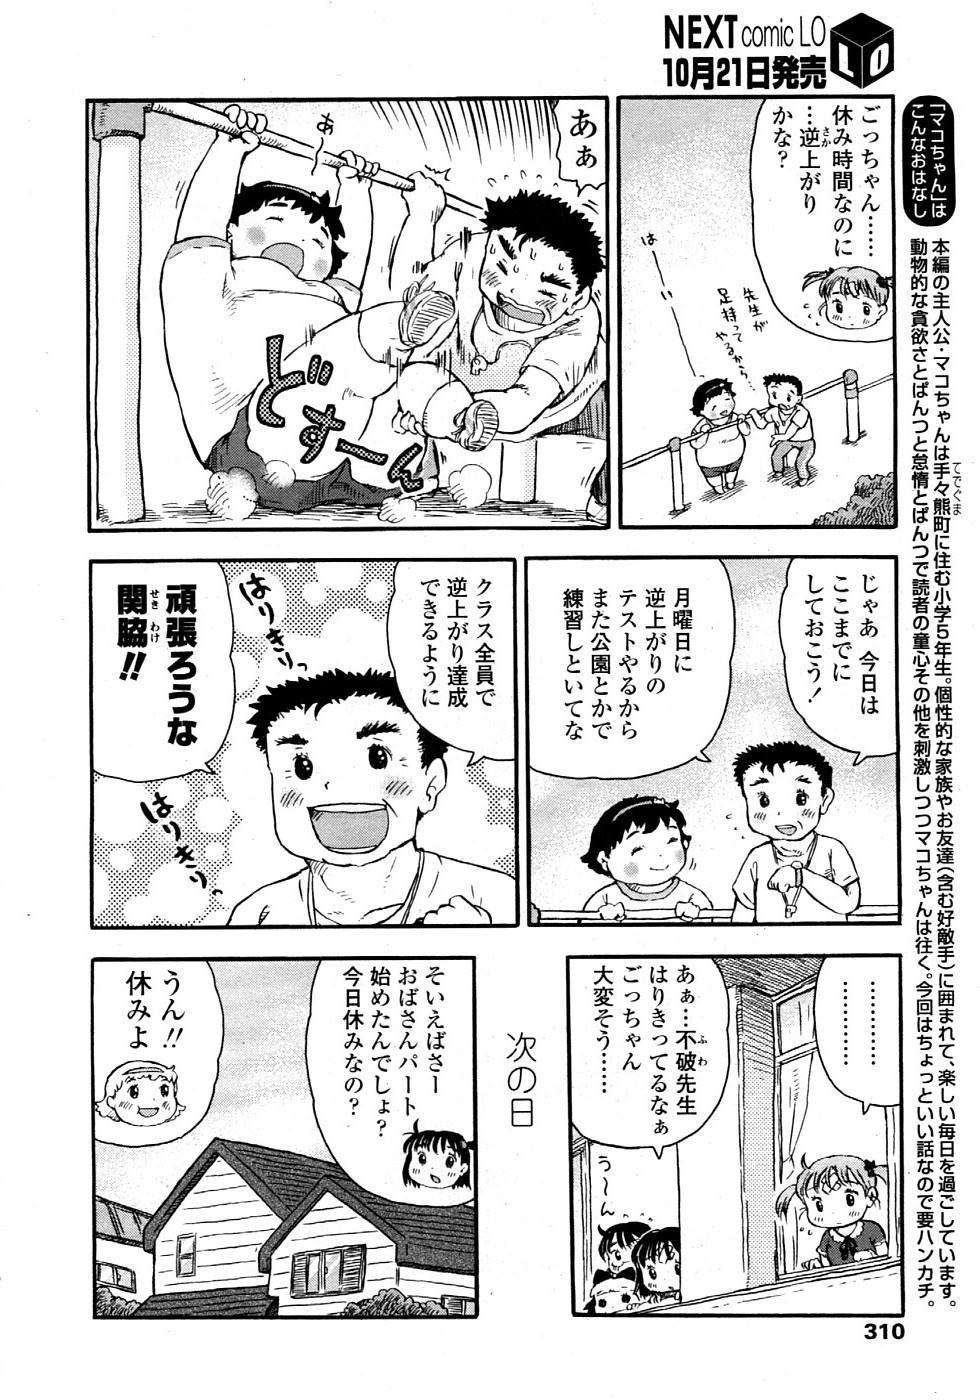 Comic LO 2008-11 Vol. 56 309